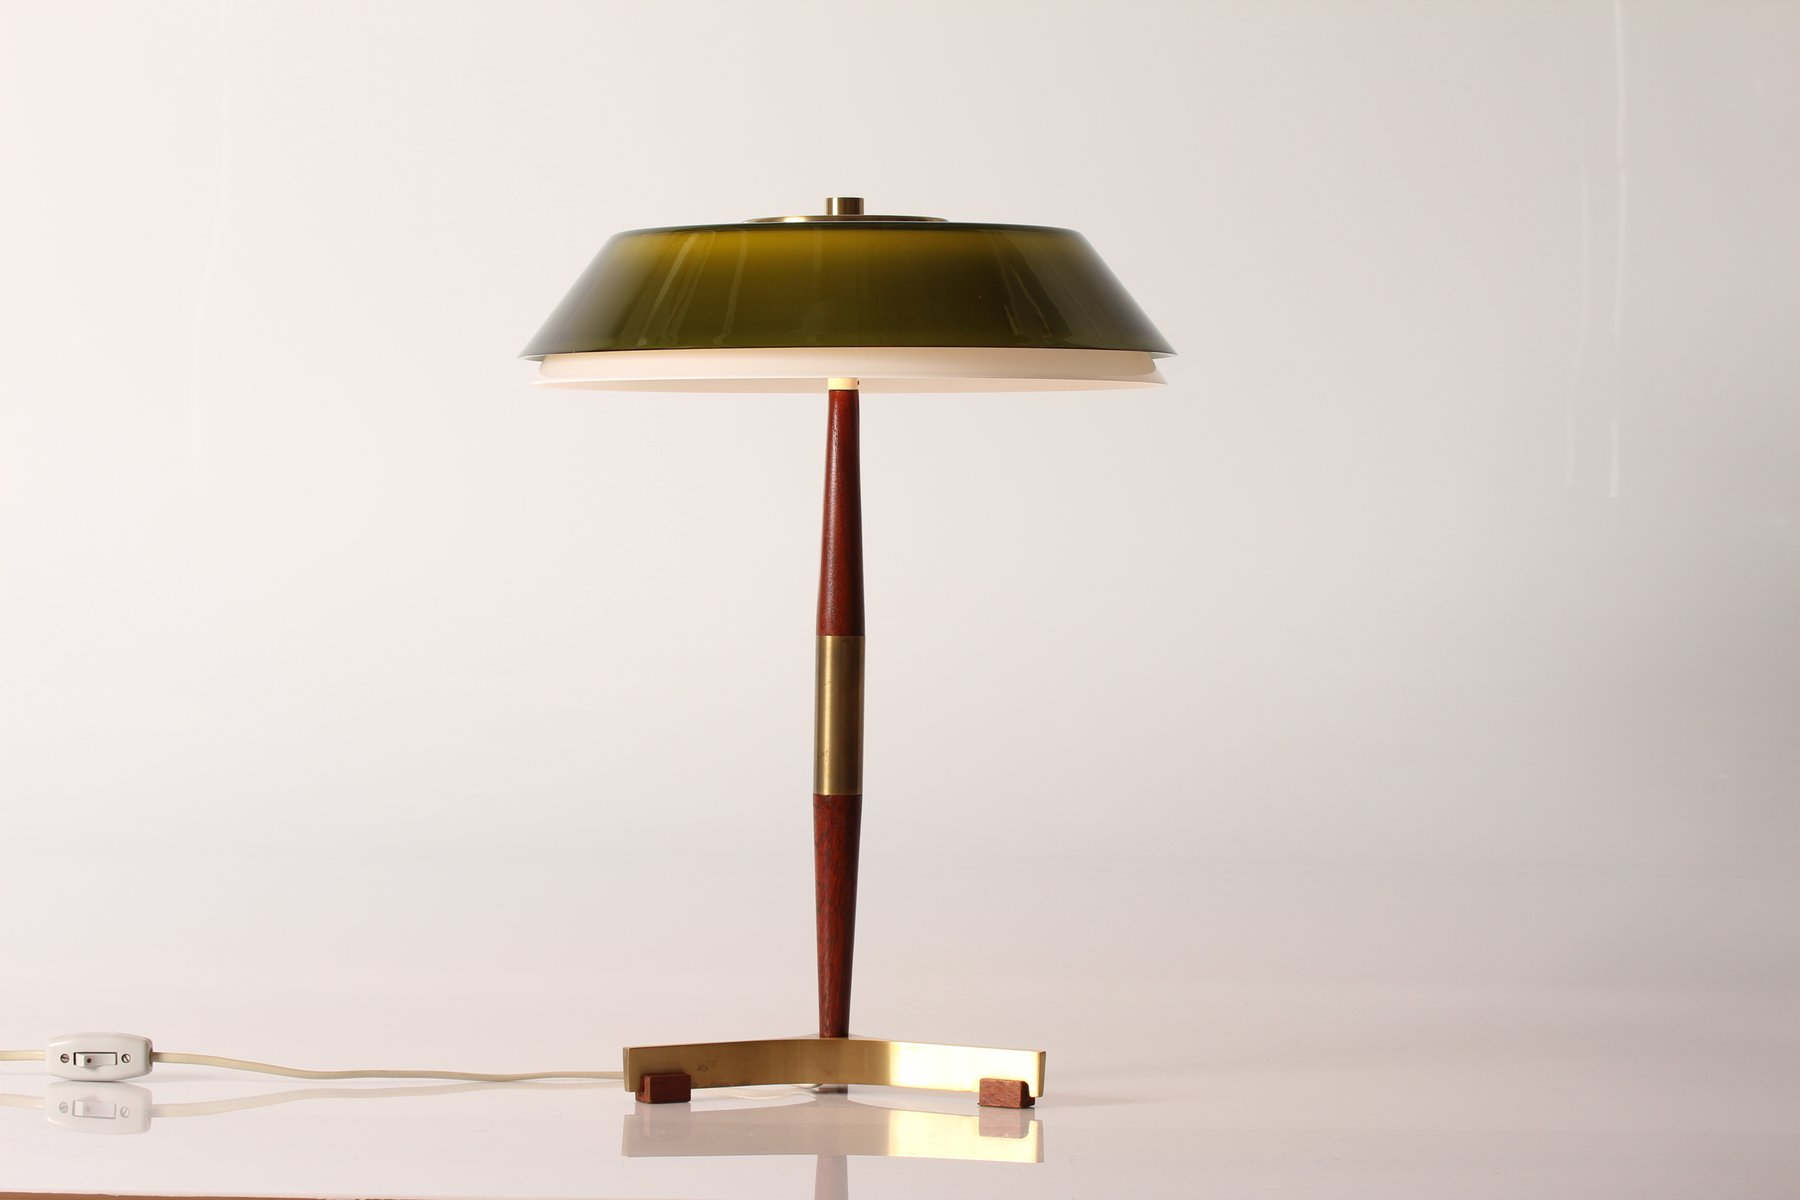 Lampadario In Legno Wood Mania : Lampadario in legno wood mania lampada da tavolo a fungo di